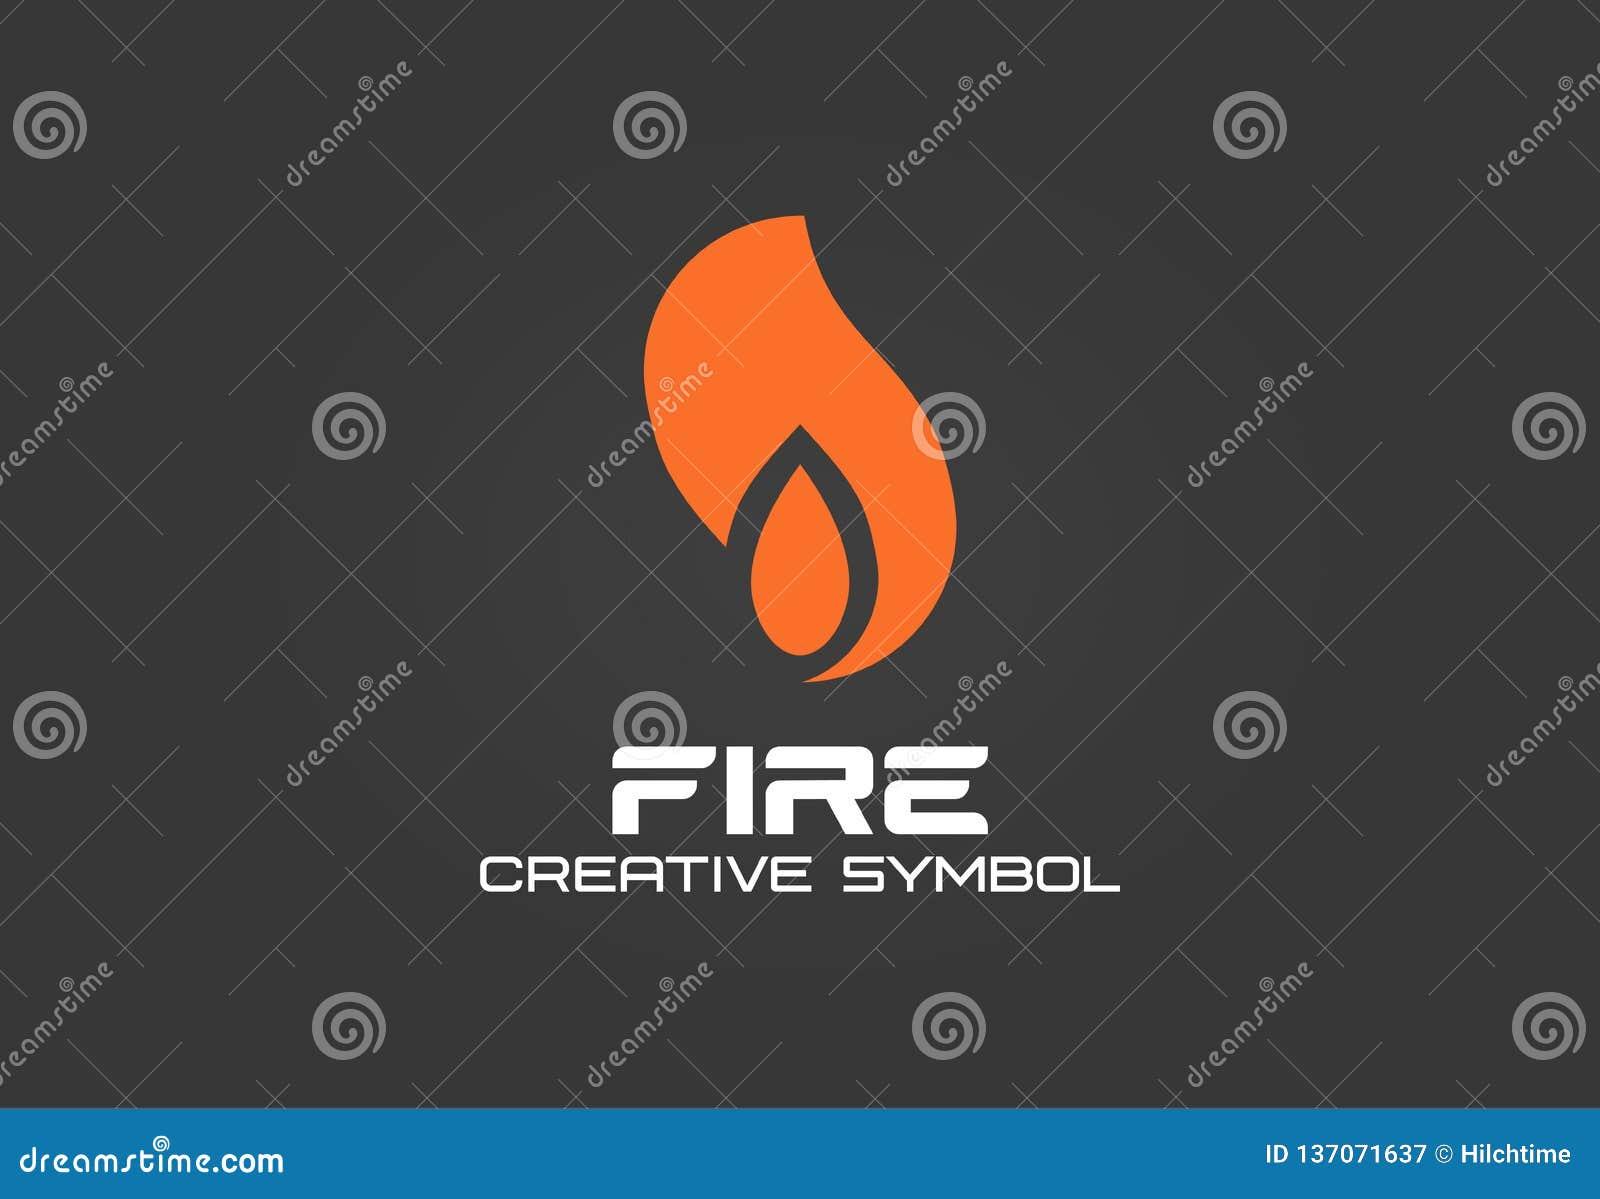 Fire creative symbol concept. Energy flame blaze abstract business logo. Flash gas ignite, smoke hot air shape, black